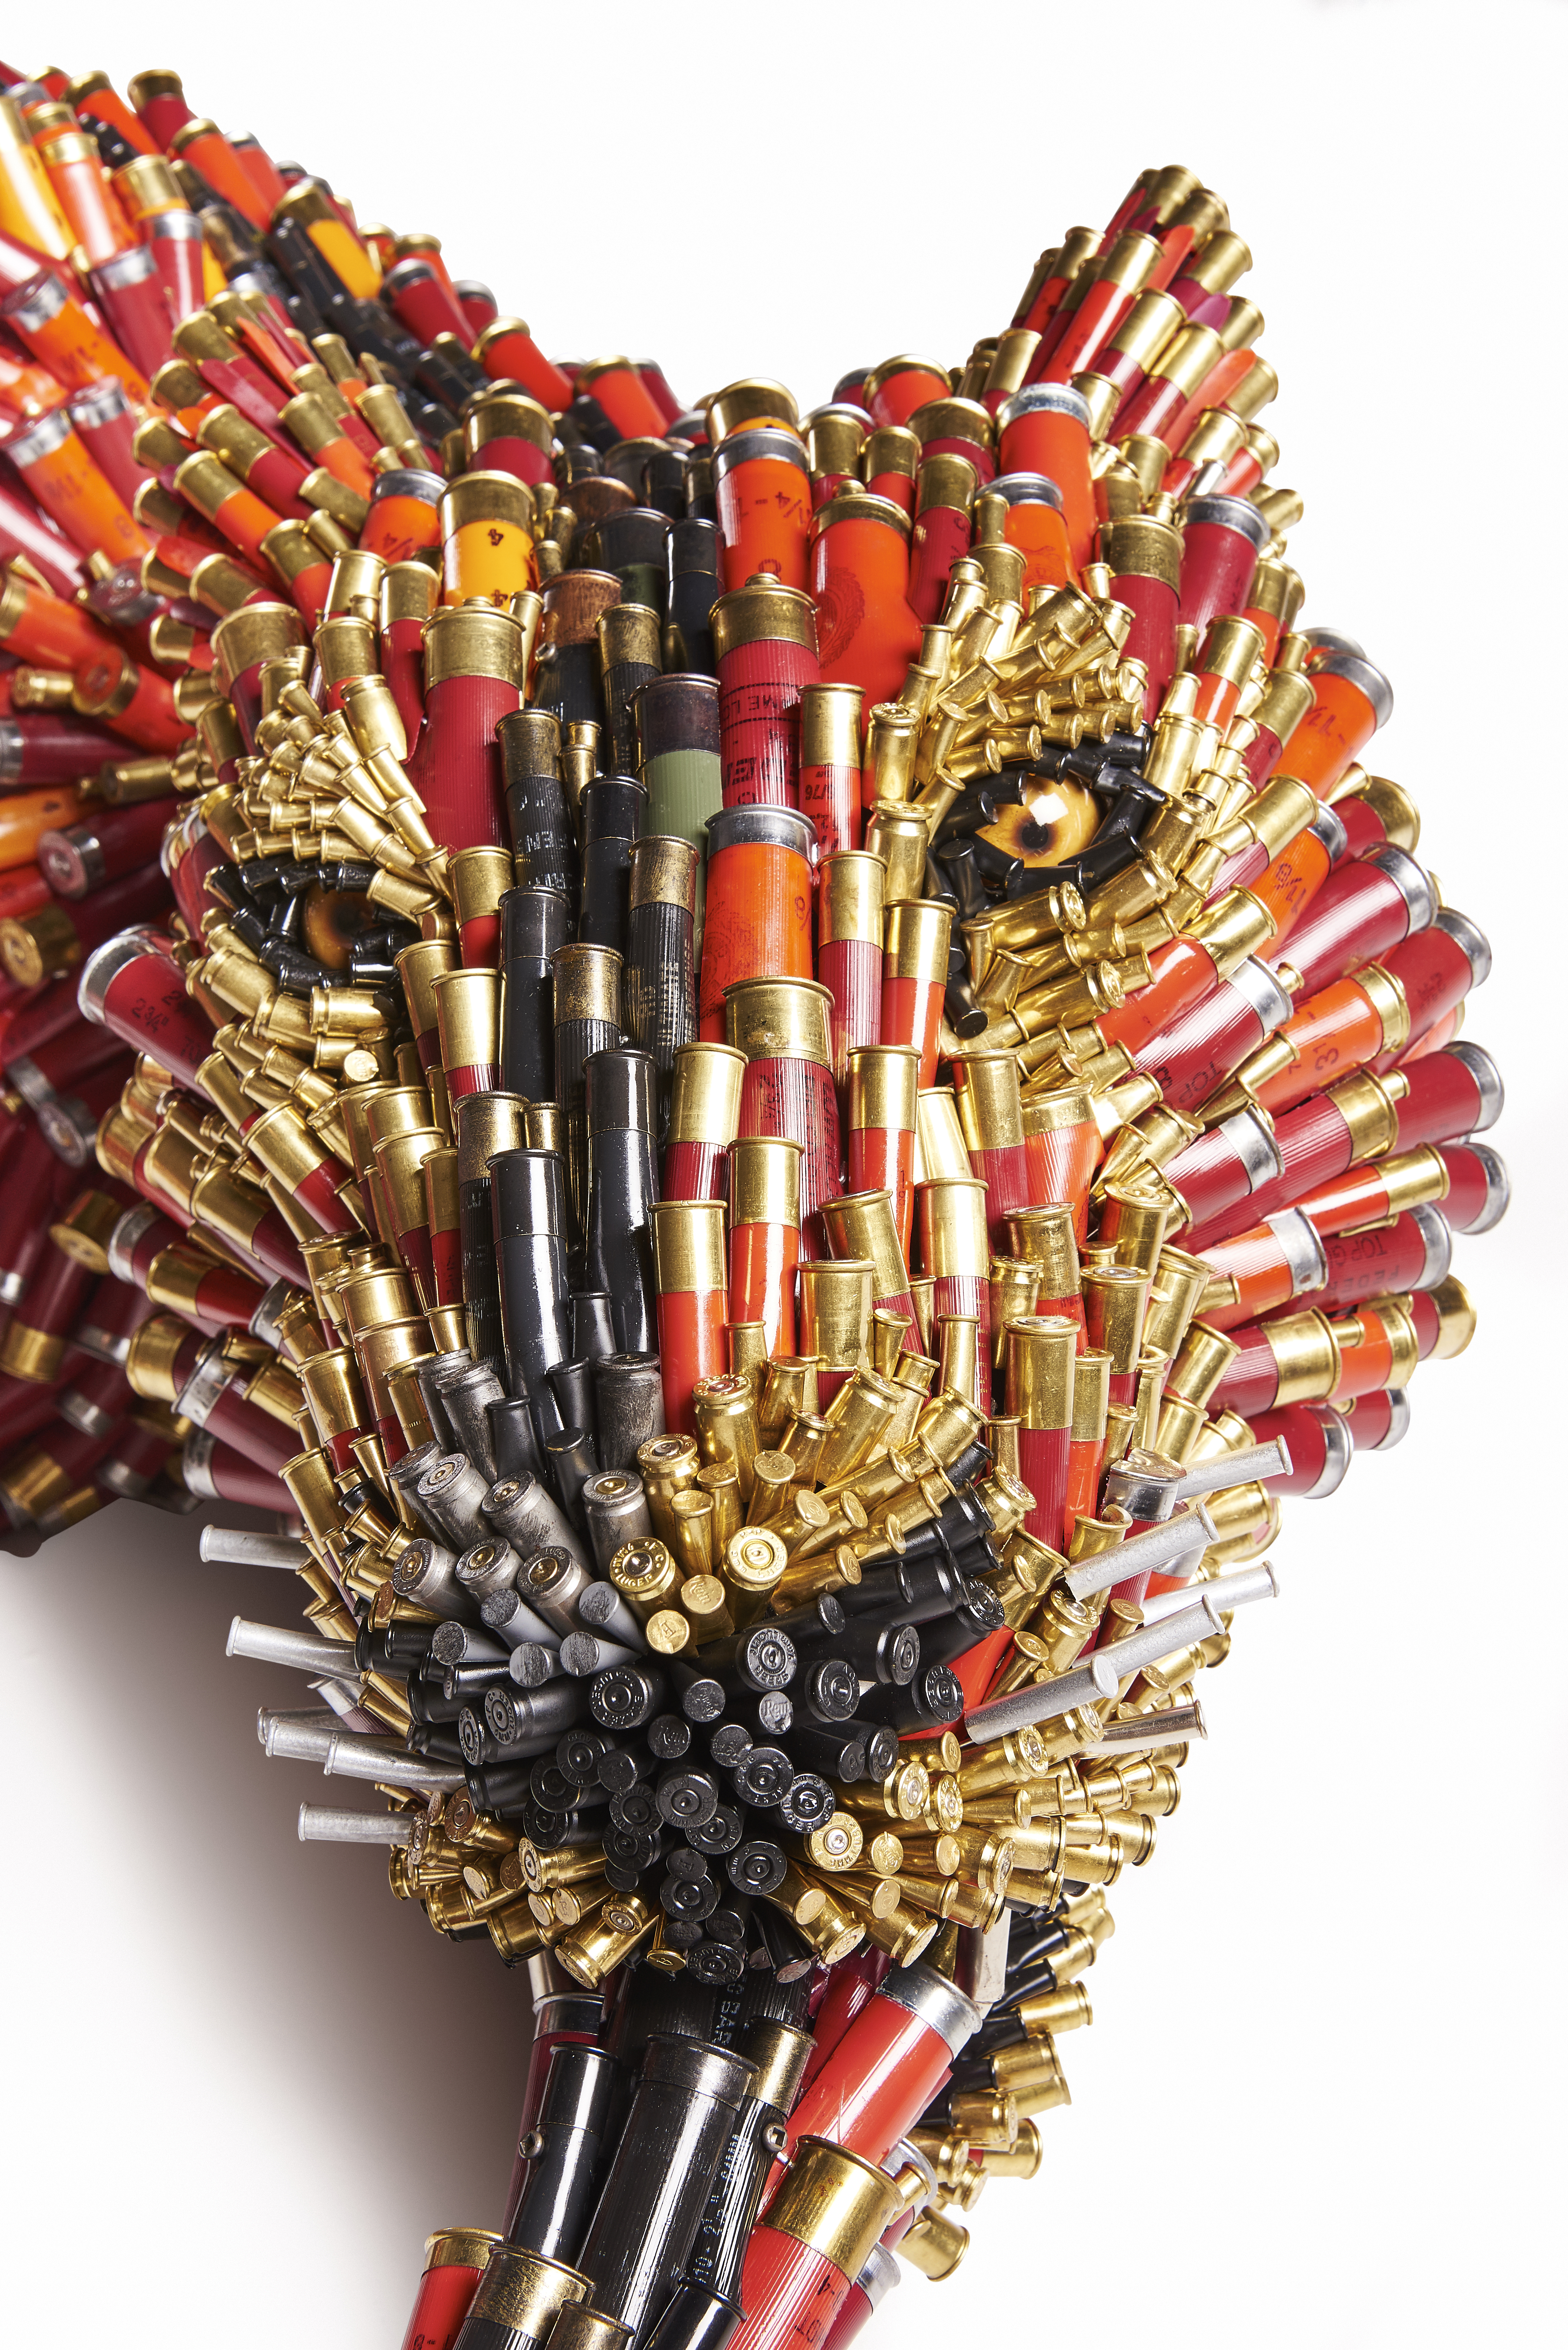 artist Federico Uribe Adelson Galleries, New York, Boston   bullet shell art, avant-garde, art, fine art, artist, gallery, art gallery, exhibit, Impressionism, Realism, Modernism